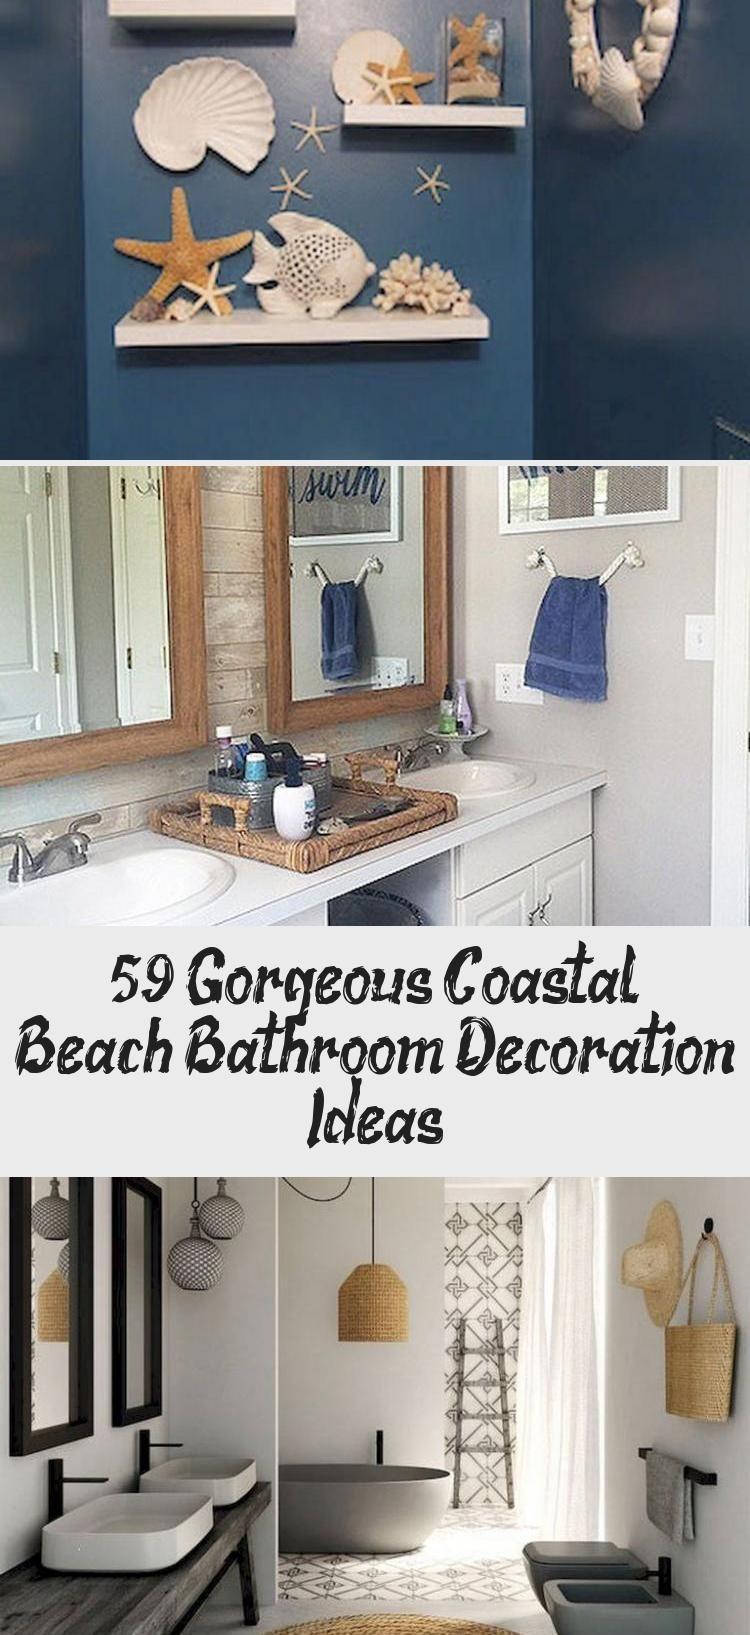 59 Gorgeous Coastal Beach Bathroom Decoration Ideas Decor Bathroom Beach Co Bathroom Beach Coasta Beach Bathrooms Beach Bathroom Decor Bathroom Decor